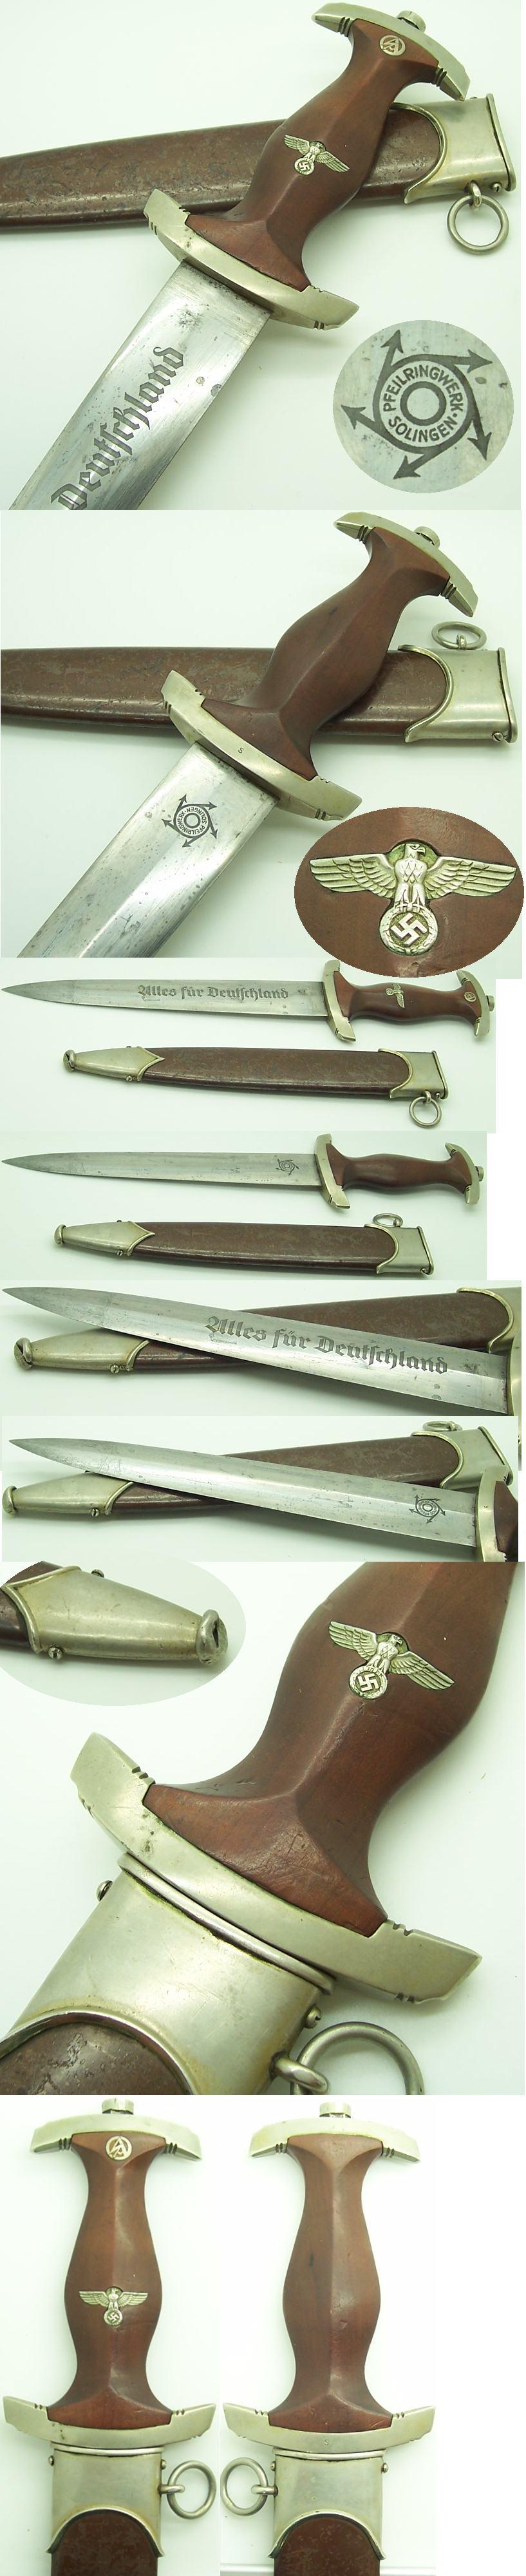 Rare Early SA Dagger by Pfeilringwerk